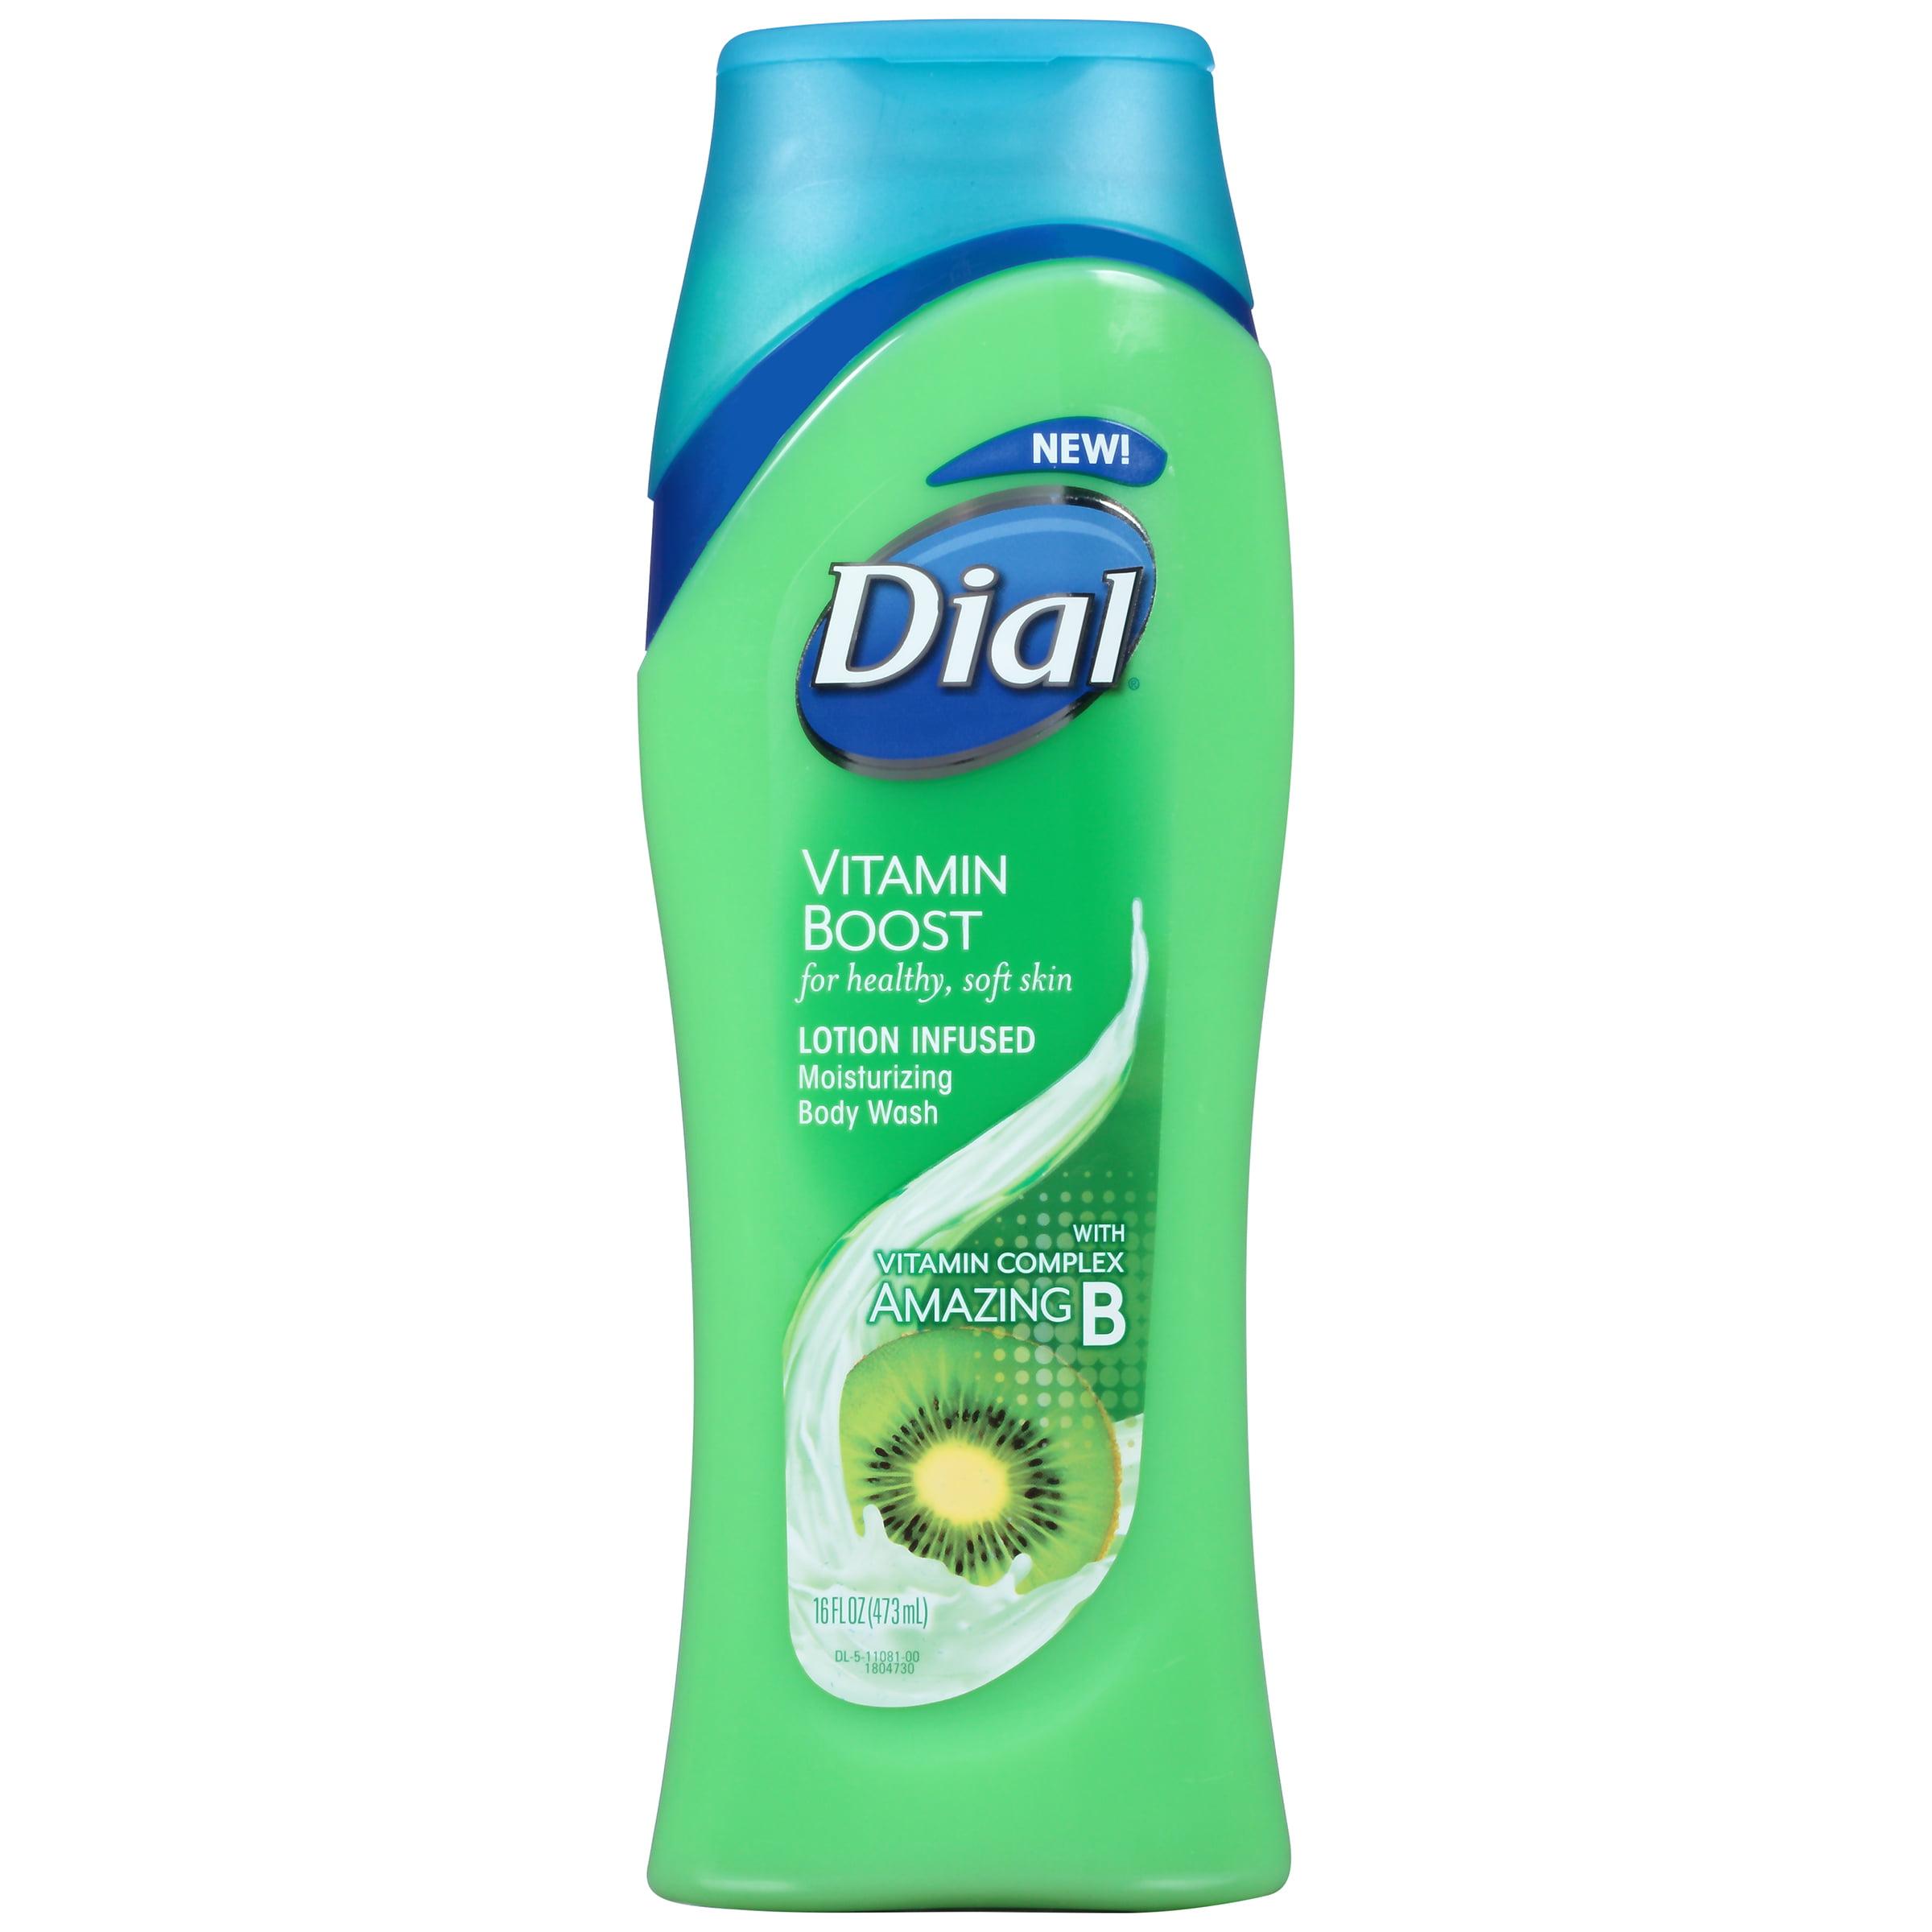 Dial Body Wash, Vitamin Boost Amazing B, 16 Ounce